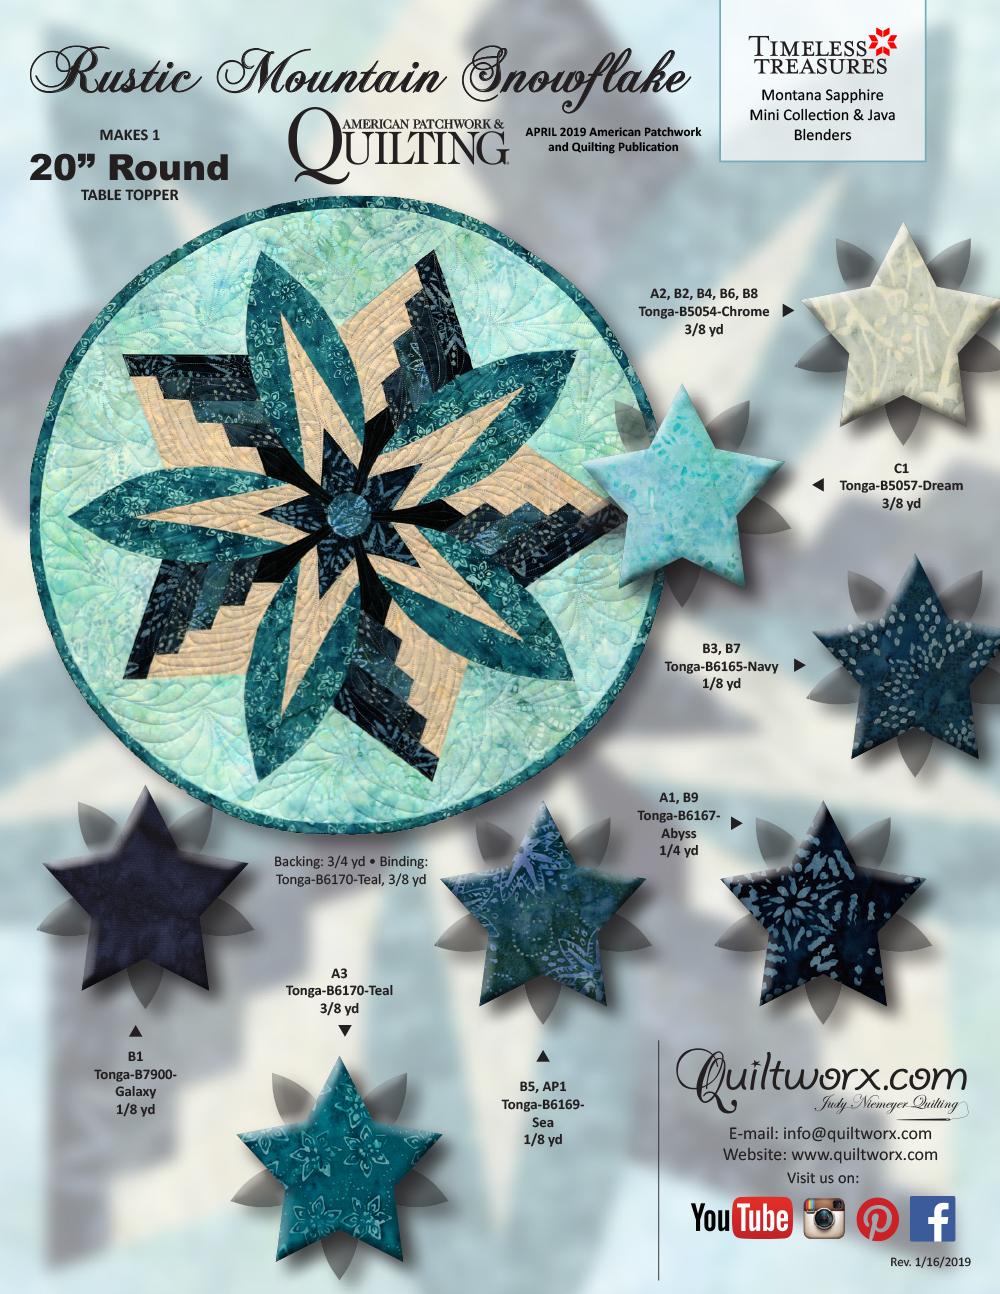 Rustic-Mtn-Snowflake-MT-Sapphire-1pg-KS